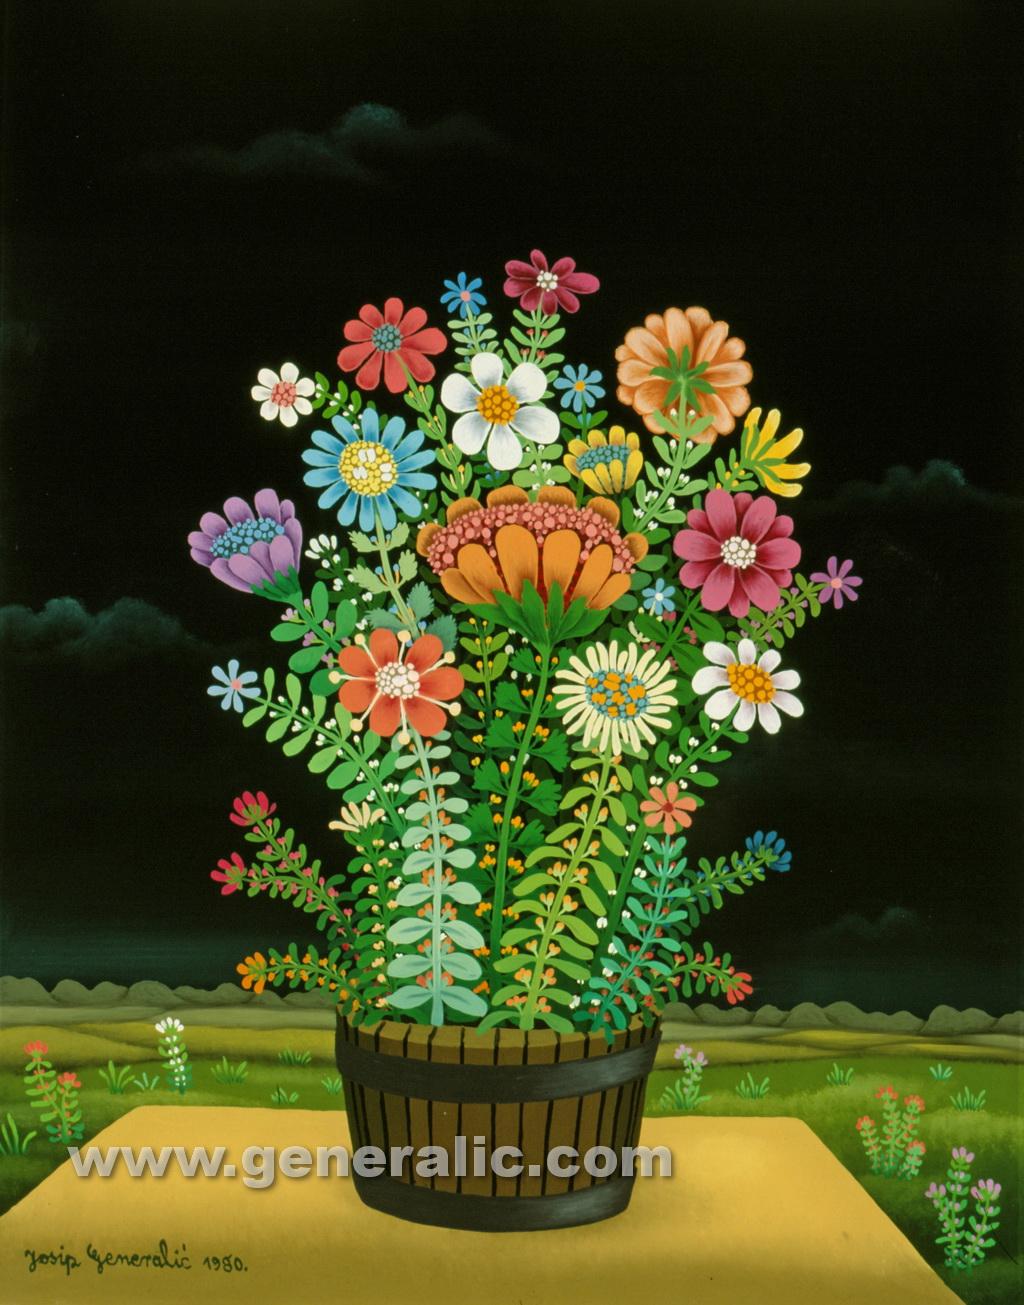 Josip Generalic, 1980, Flowers on a table, oil on glass